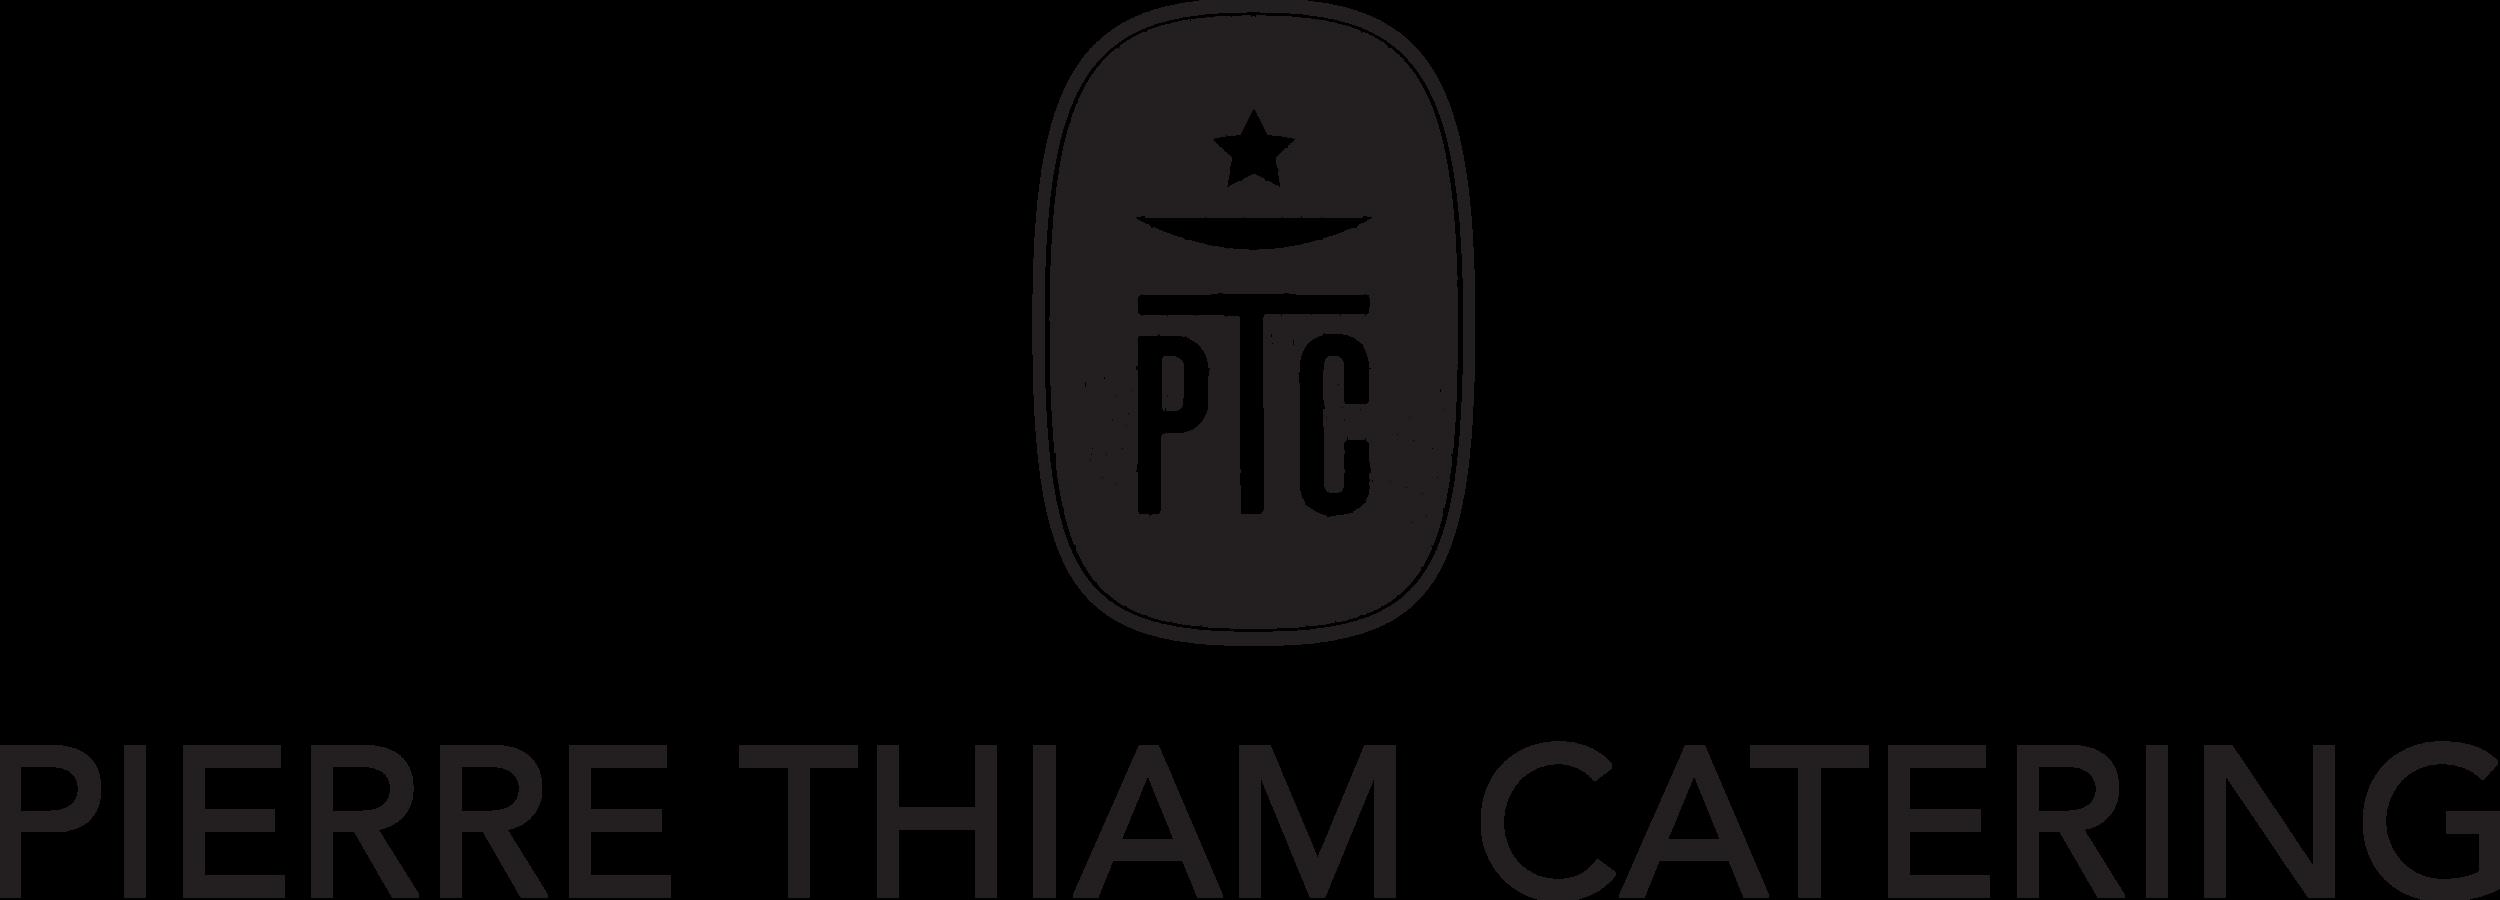 Pierre Thiam Logo.png